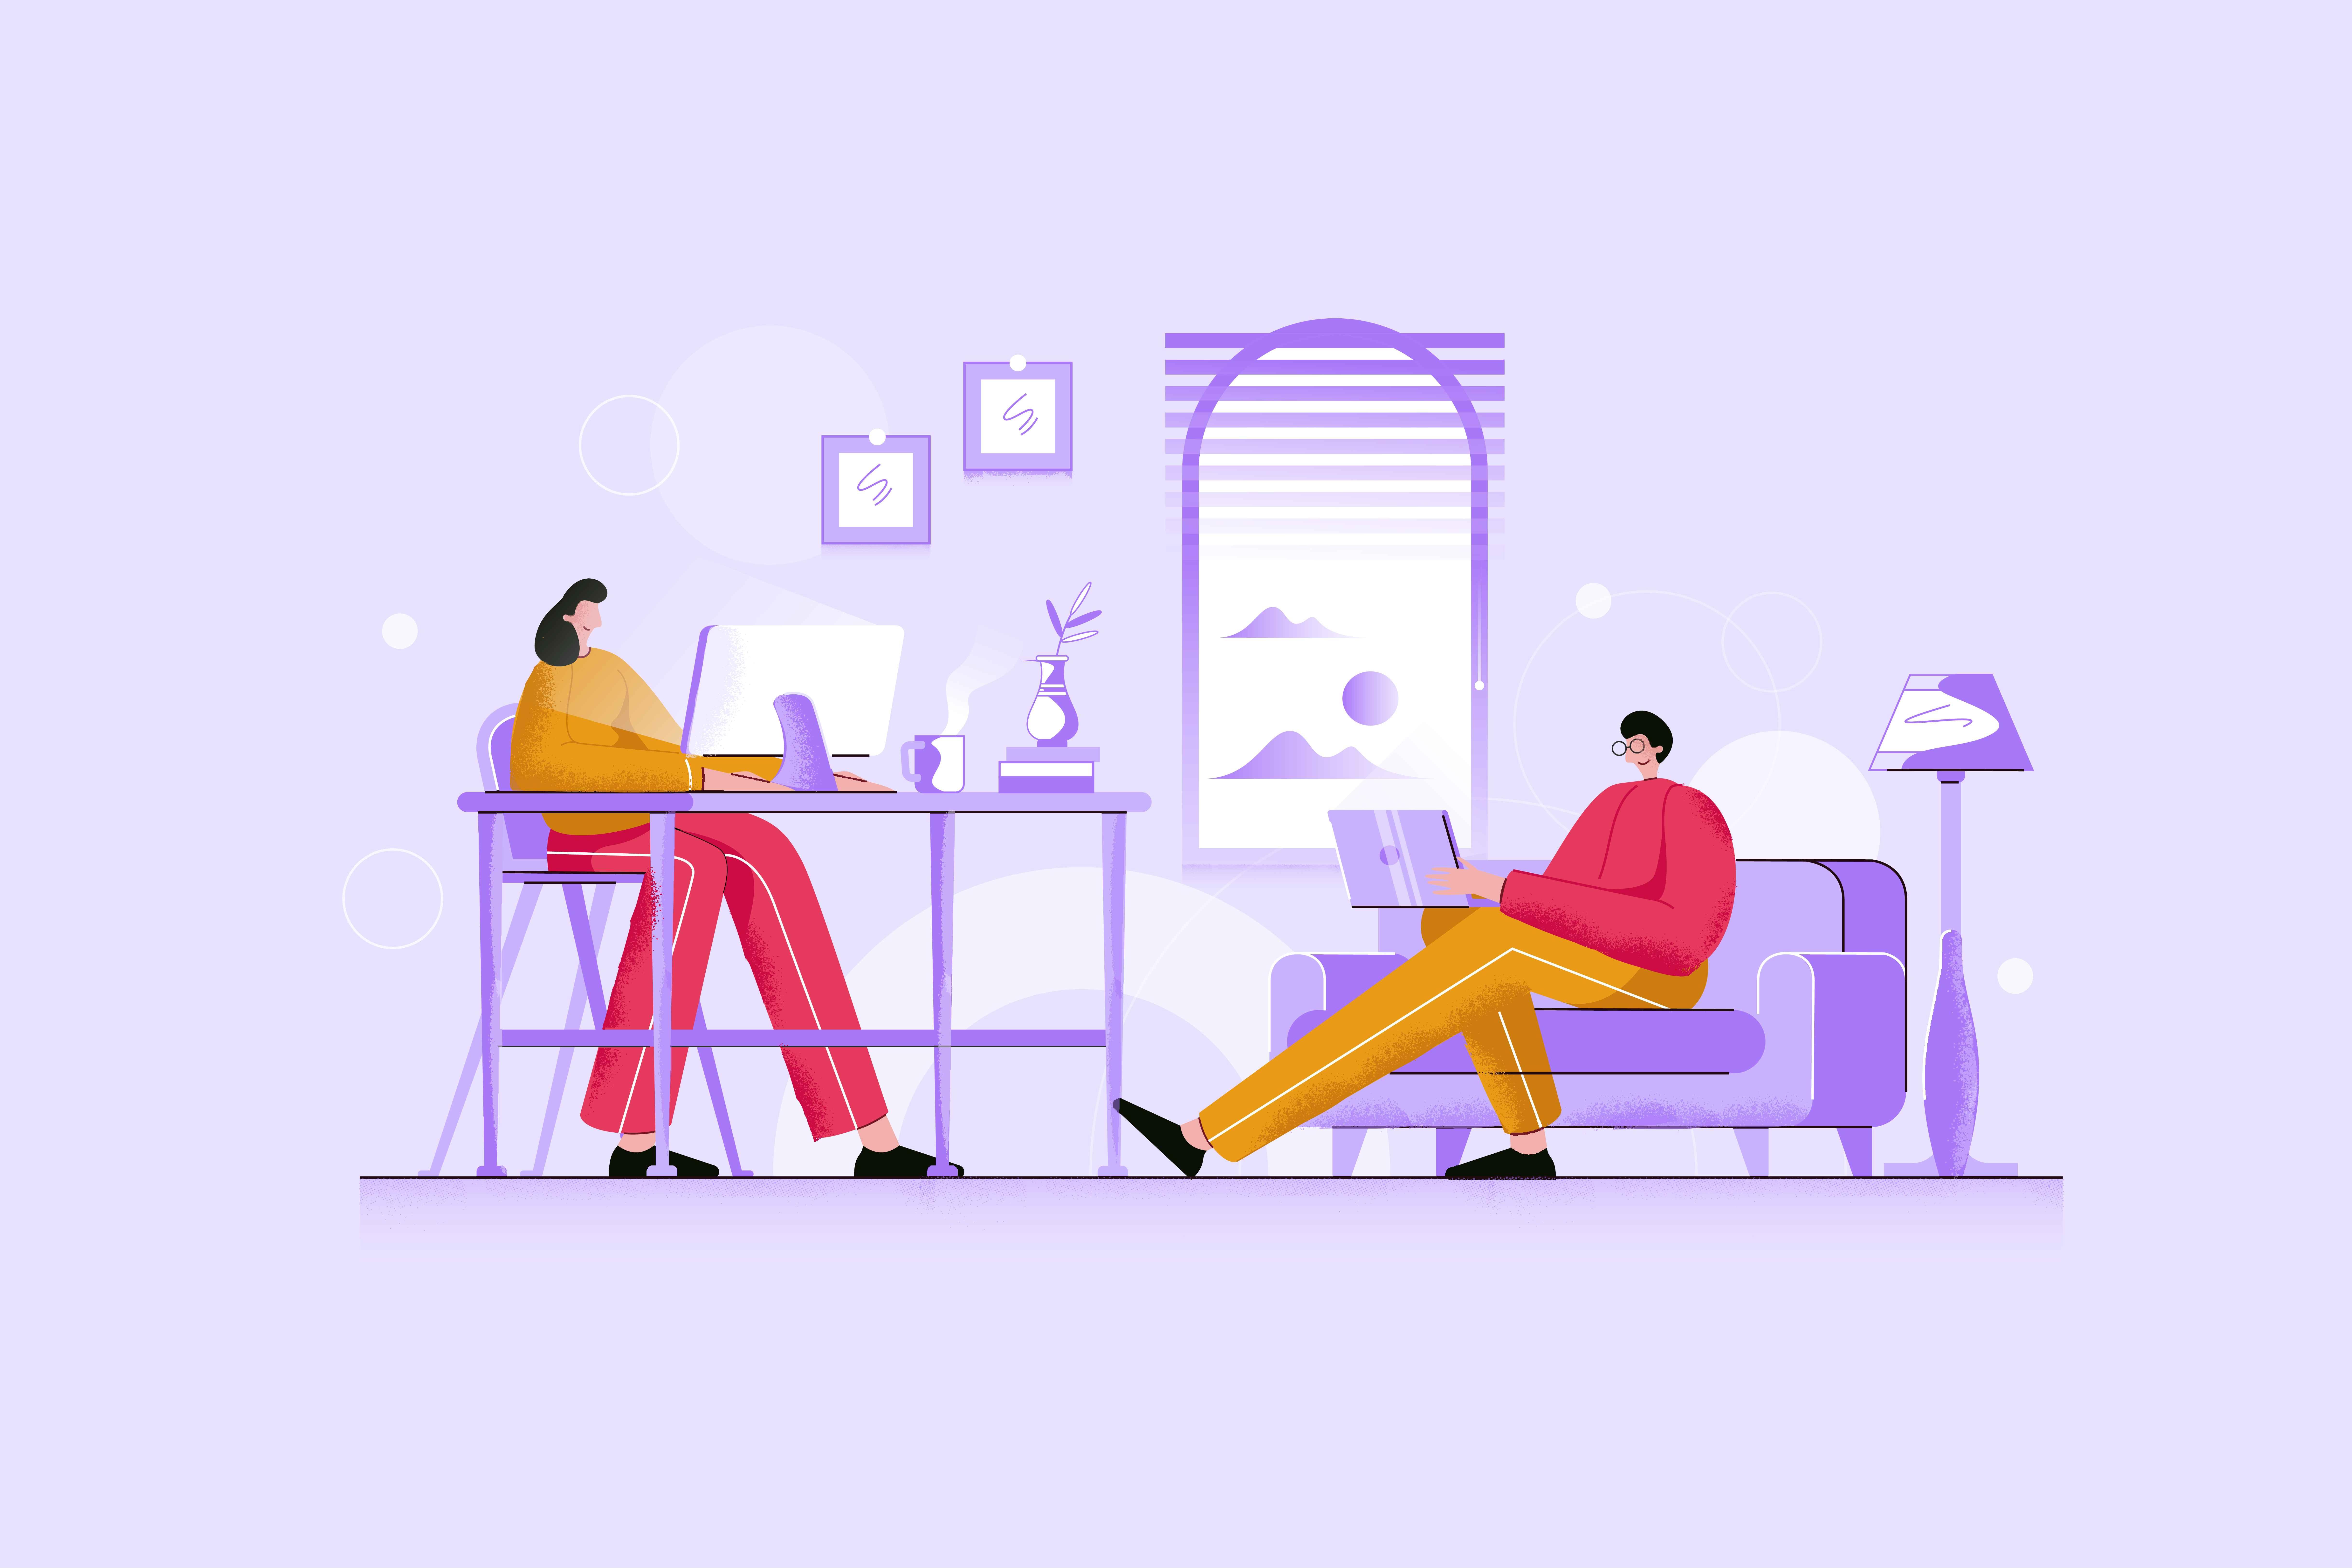 People Work - Animated Image